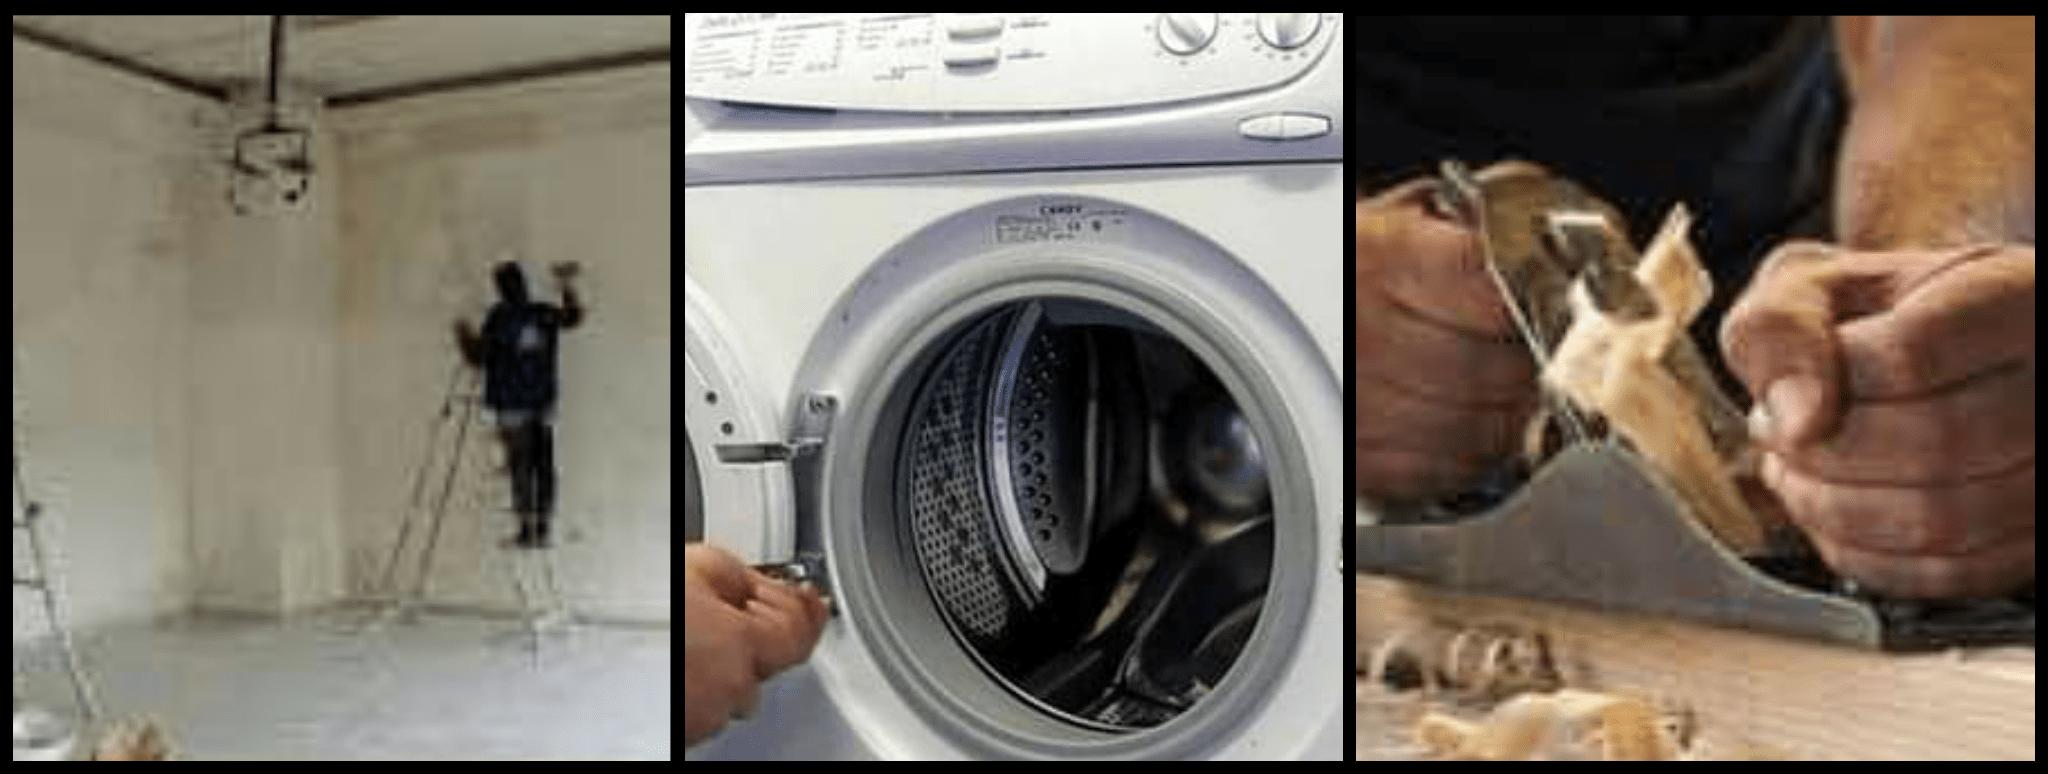 عمال كل يوم بيومو انقطعت أرزاقهم فمن يعوضهم Laundry Machine Washing Machine Home Appliances